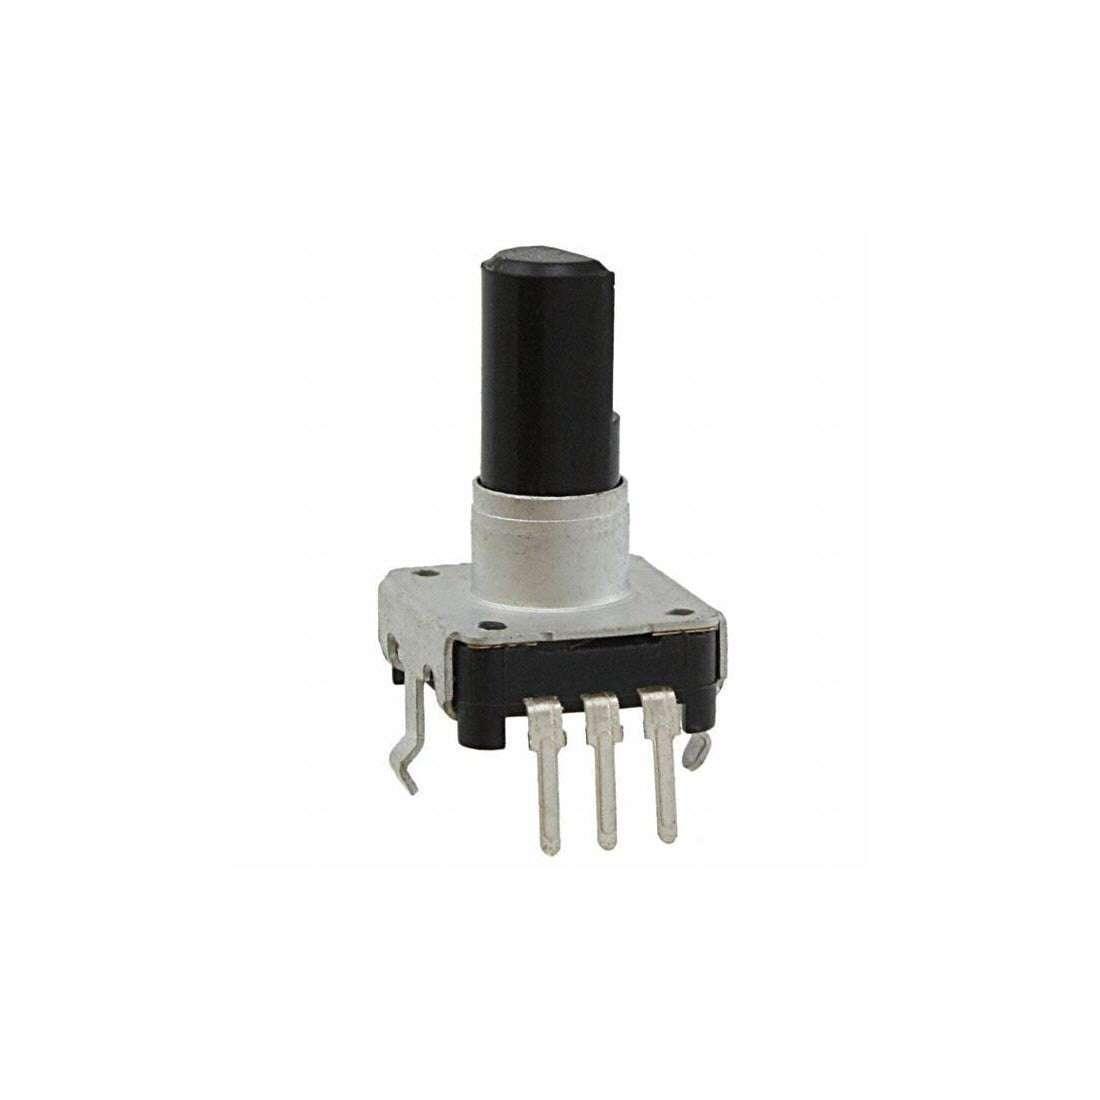 TC Helicon VoiceSolo FX150 Edit Encoder